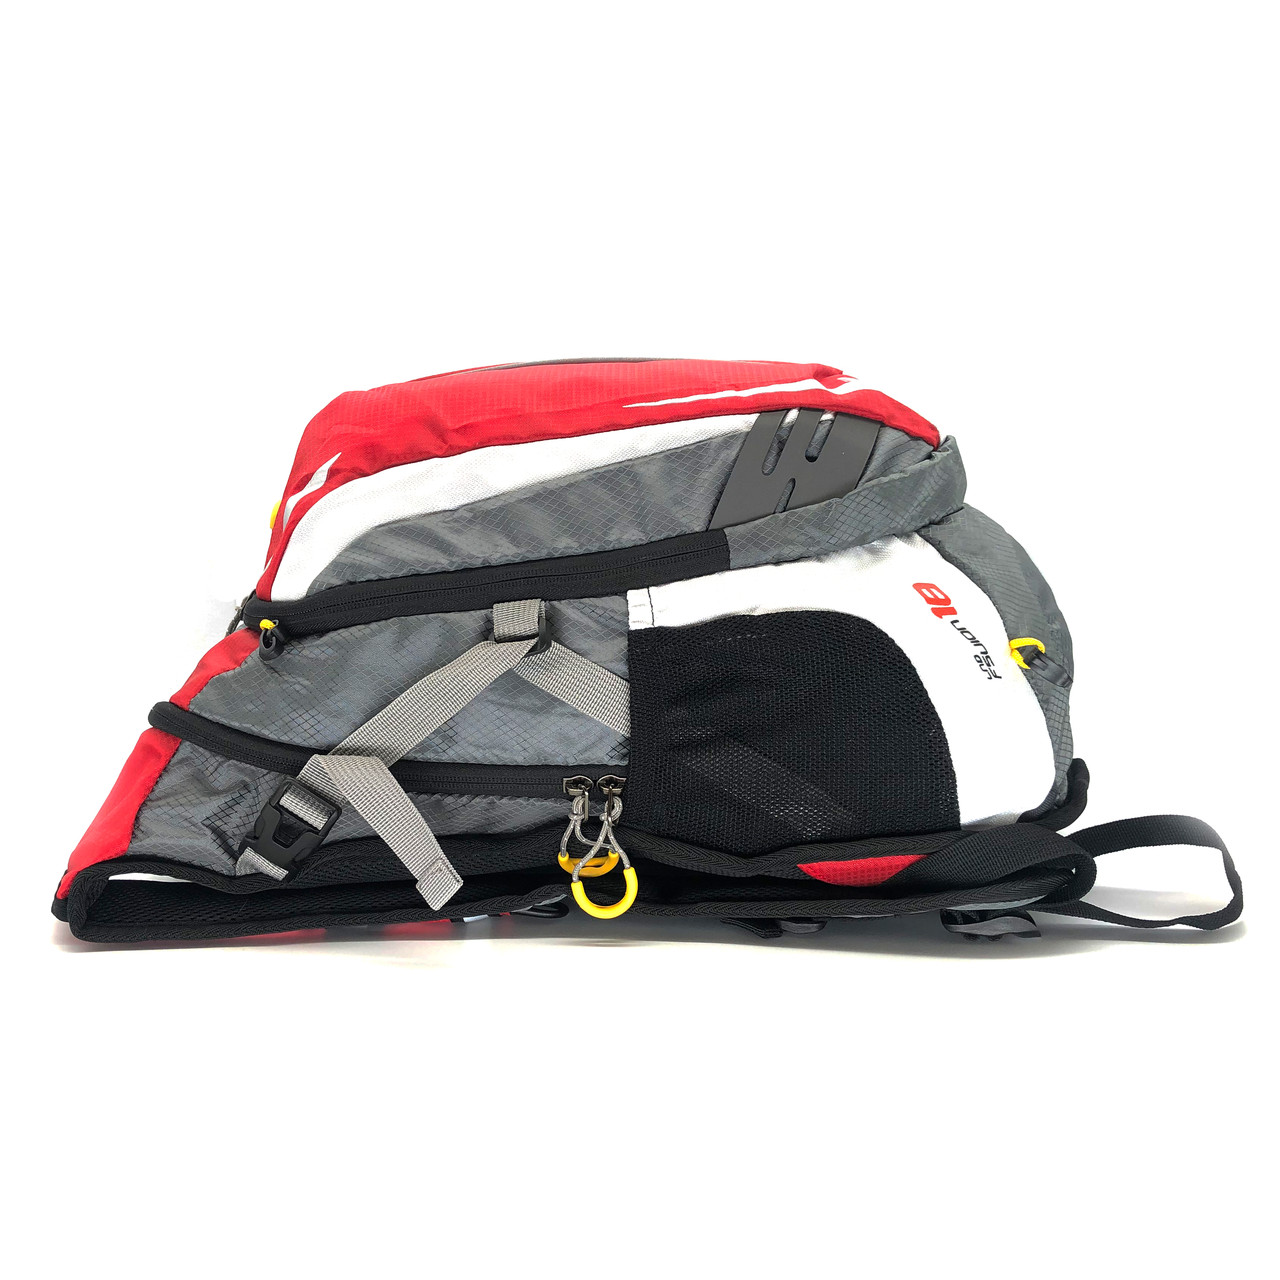 Спортивный рюкзак для бега - фото 7